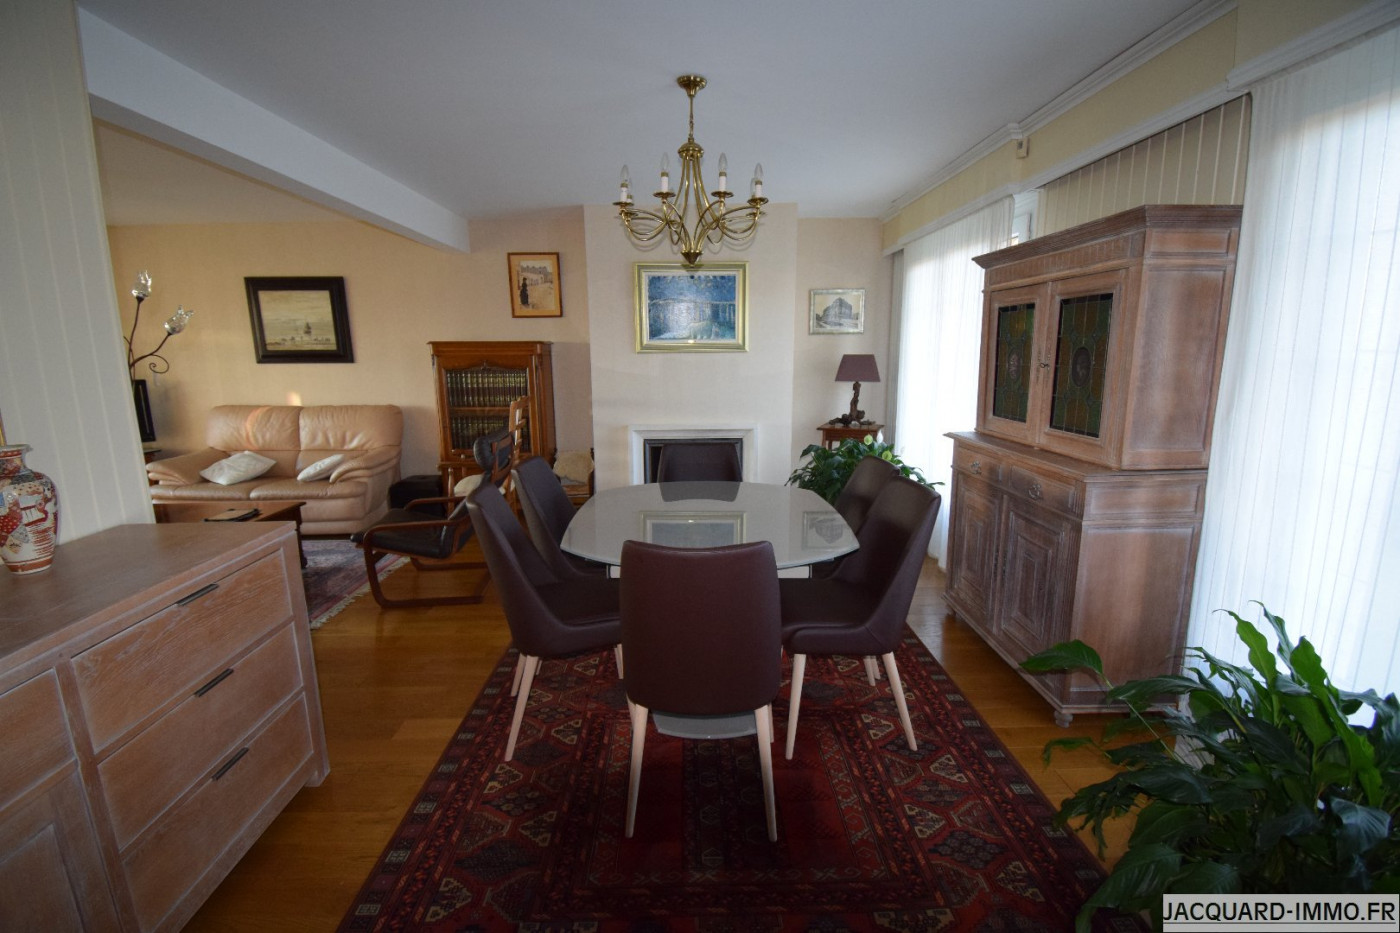 A vendre Coulogne 6200411551 Jacquard immobilier